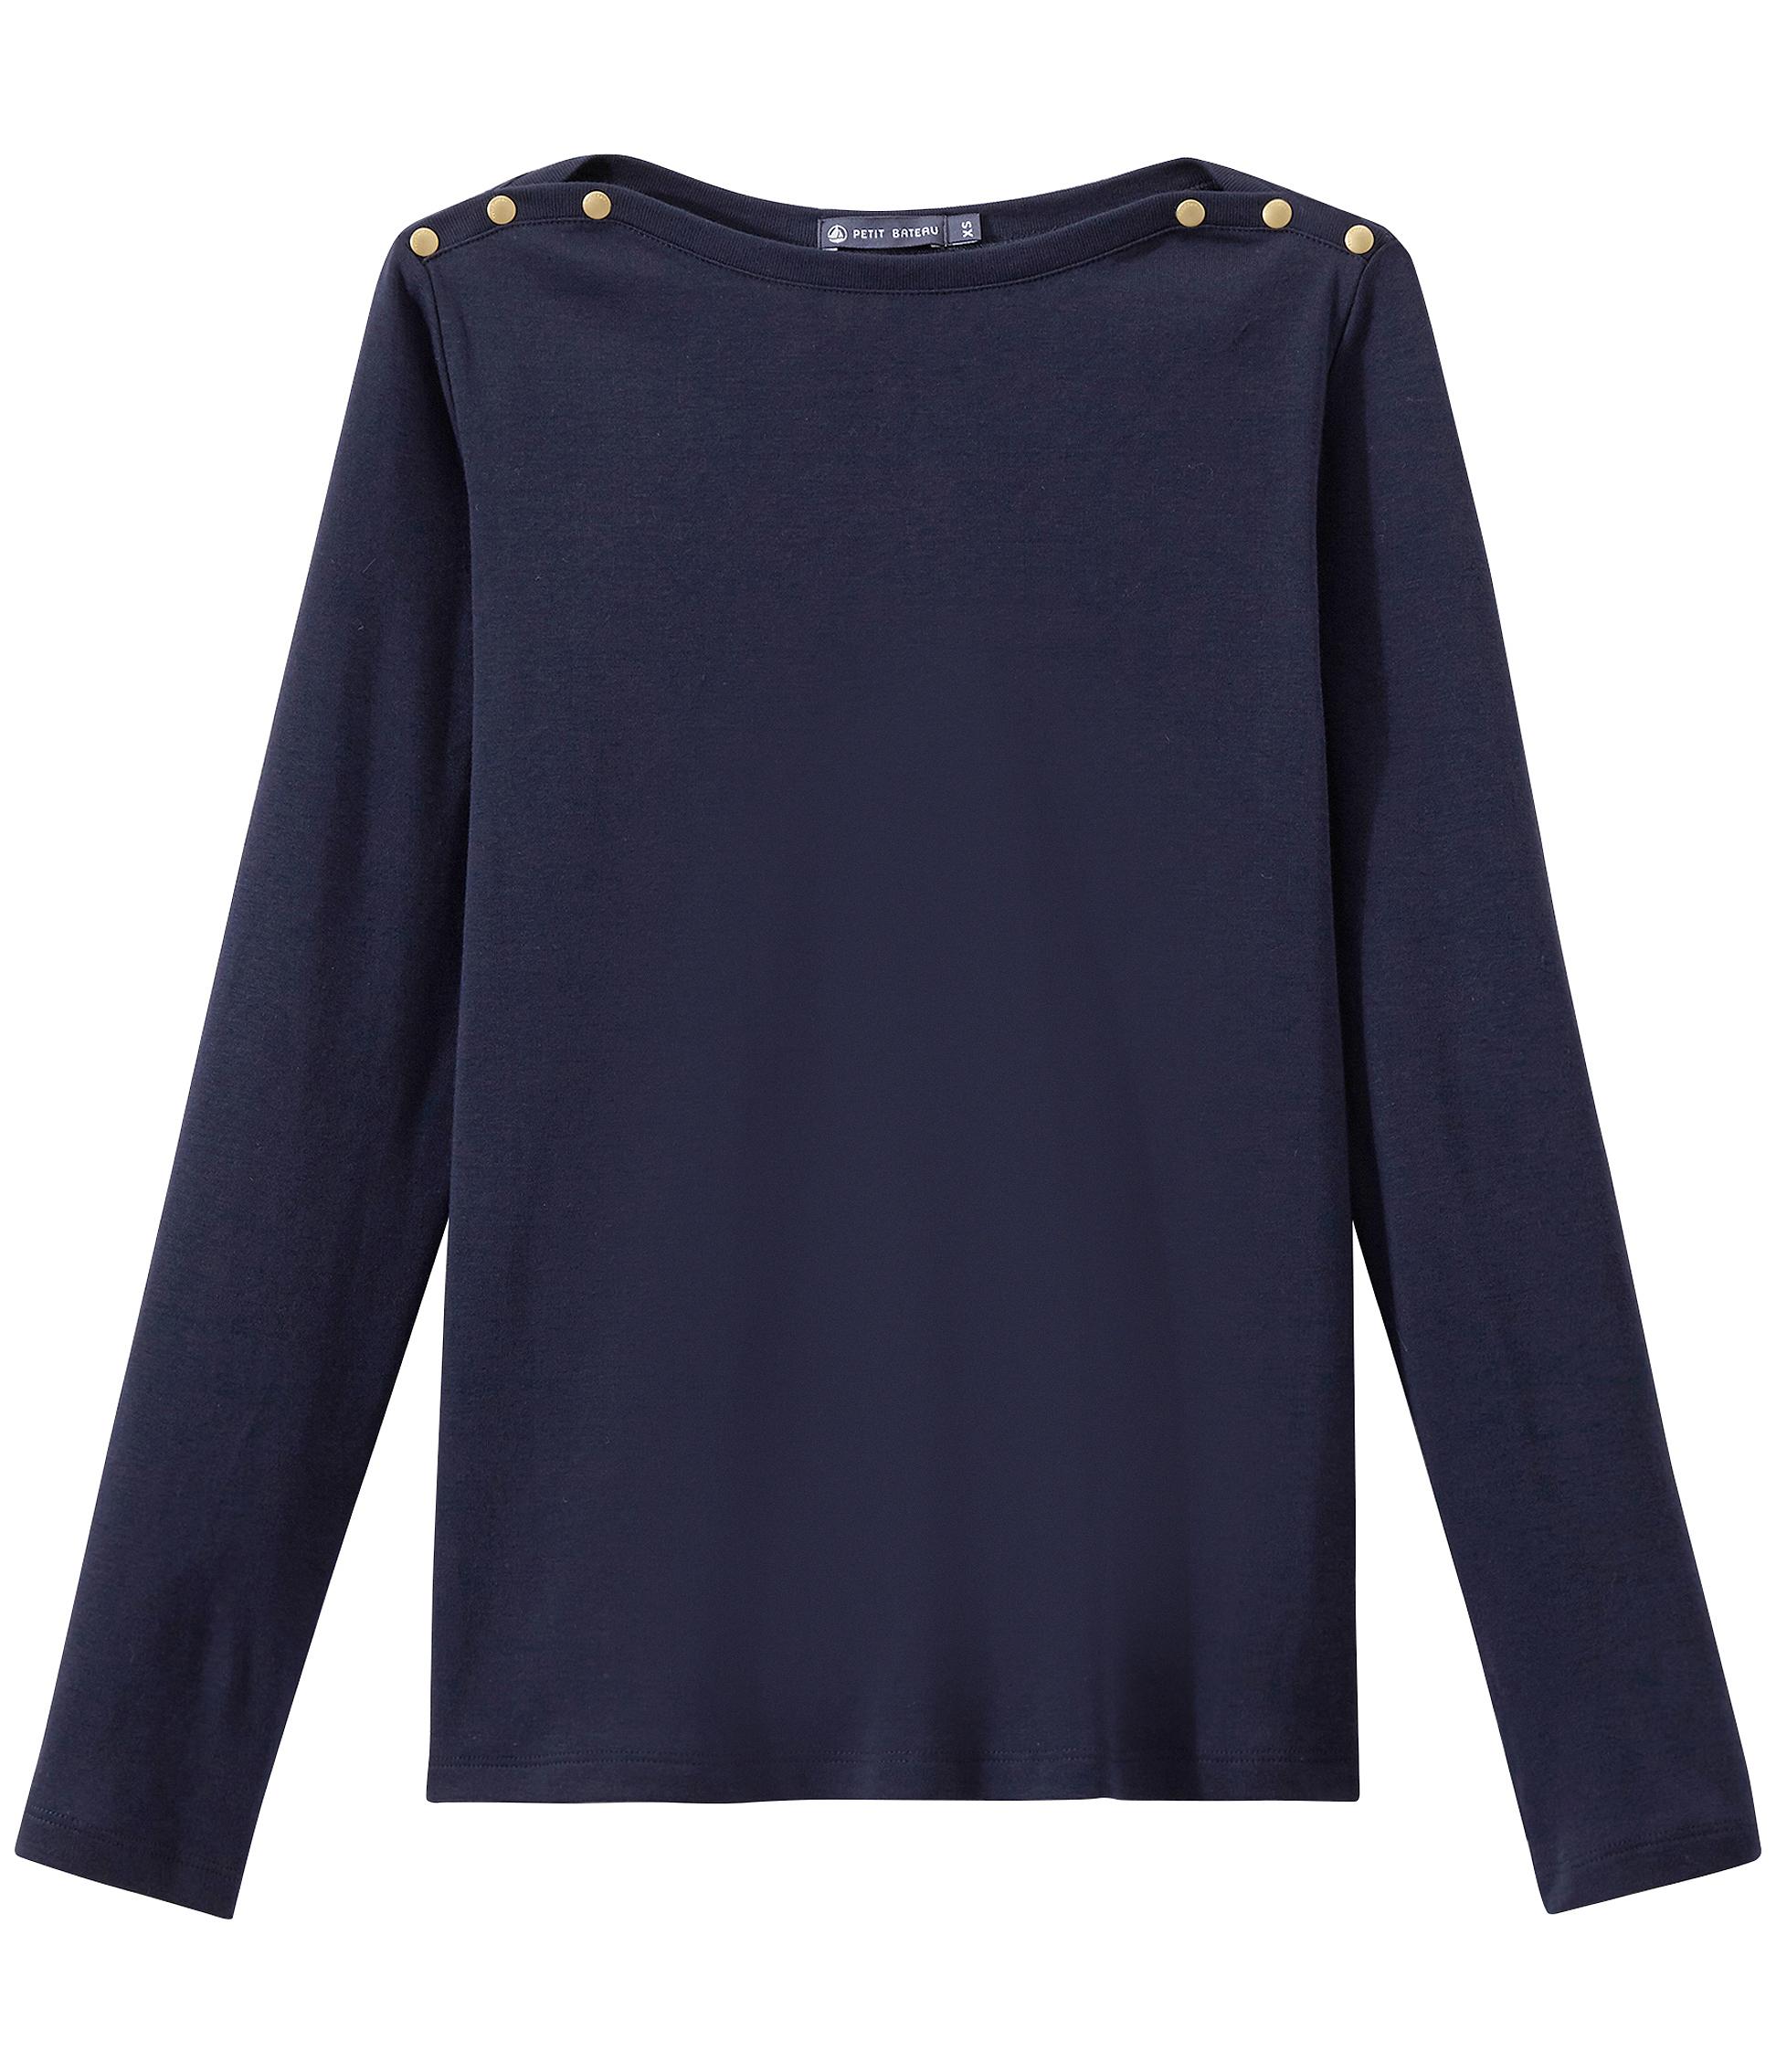 e68f31ca6 Camiseta de manga larga para mujer